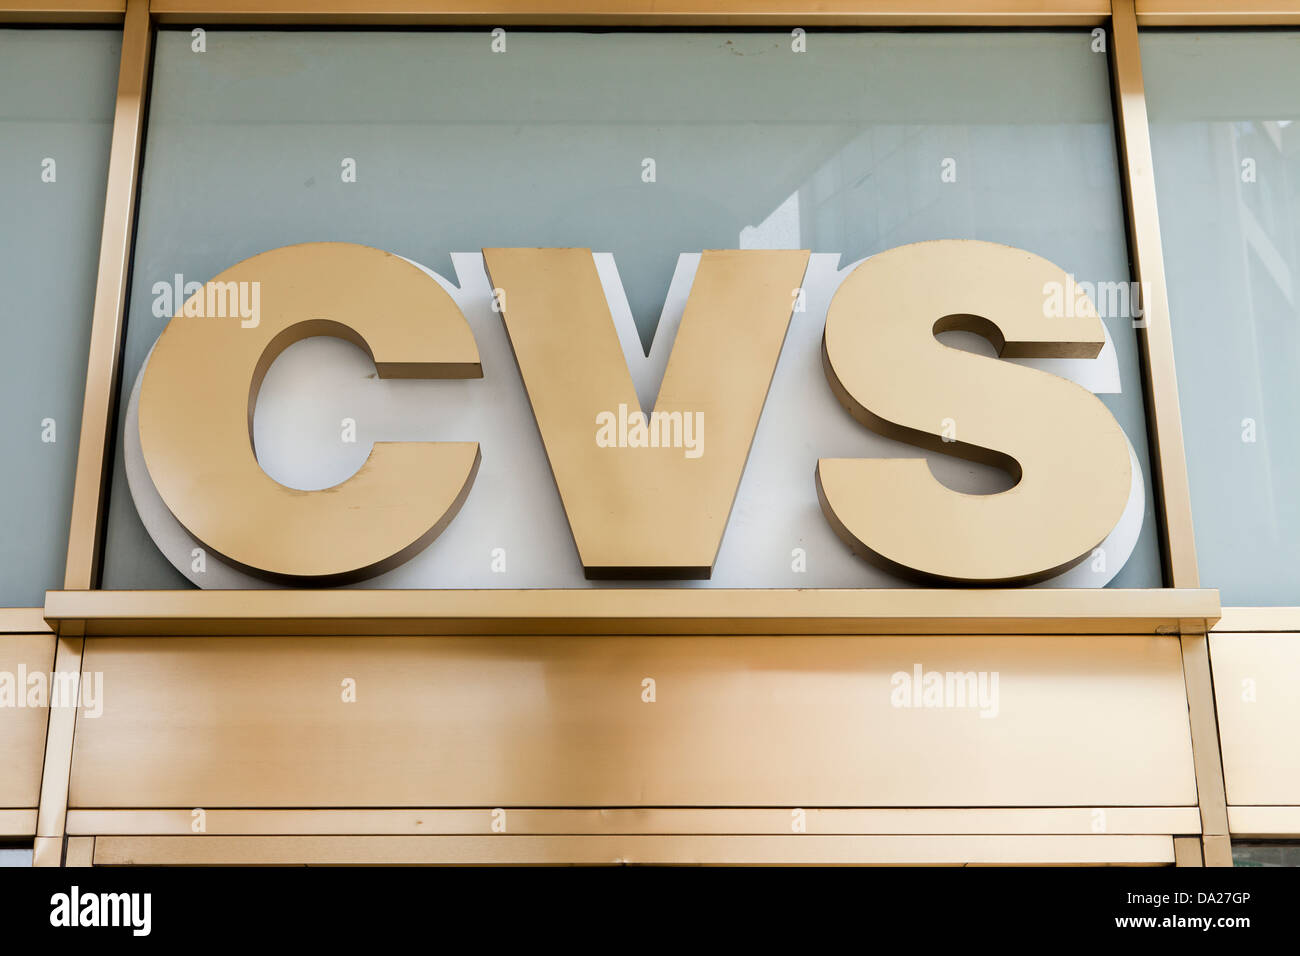 Cvs Pharmacy Storefront Sign Stock Photos Cvs Pharmacy Storefront